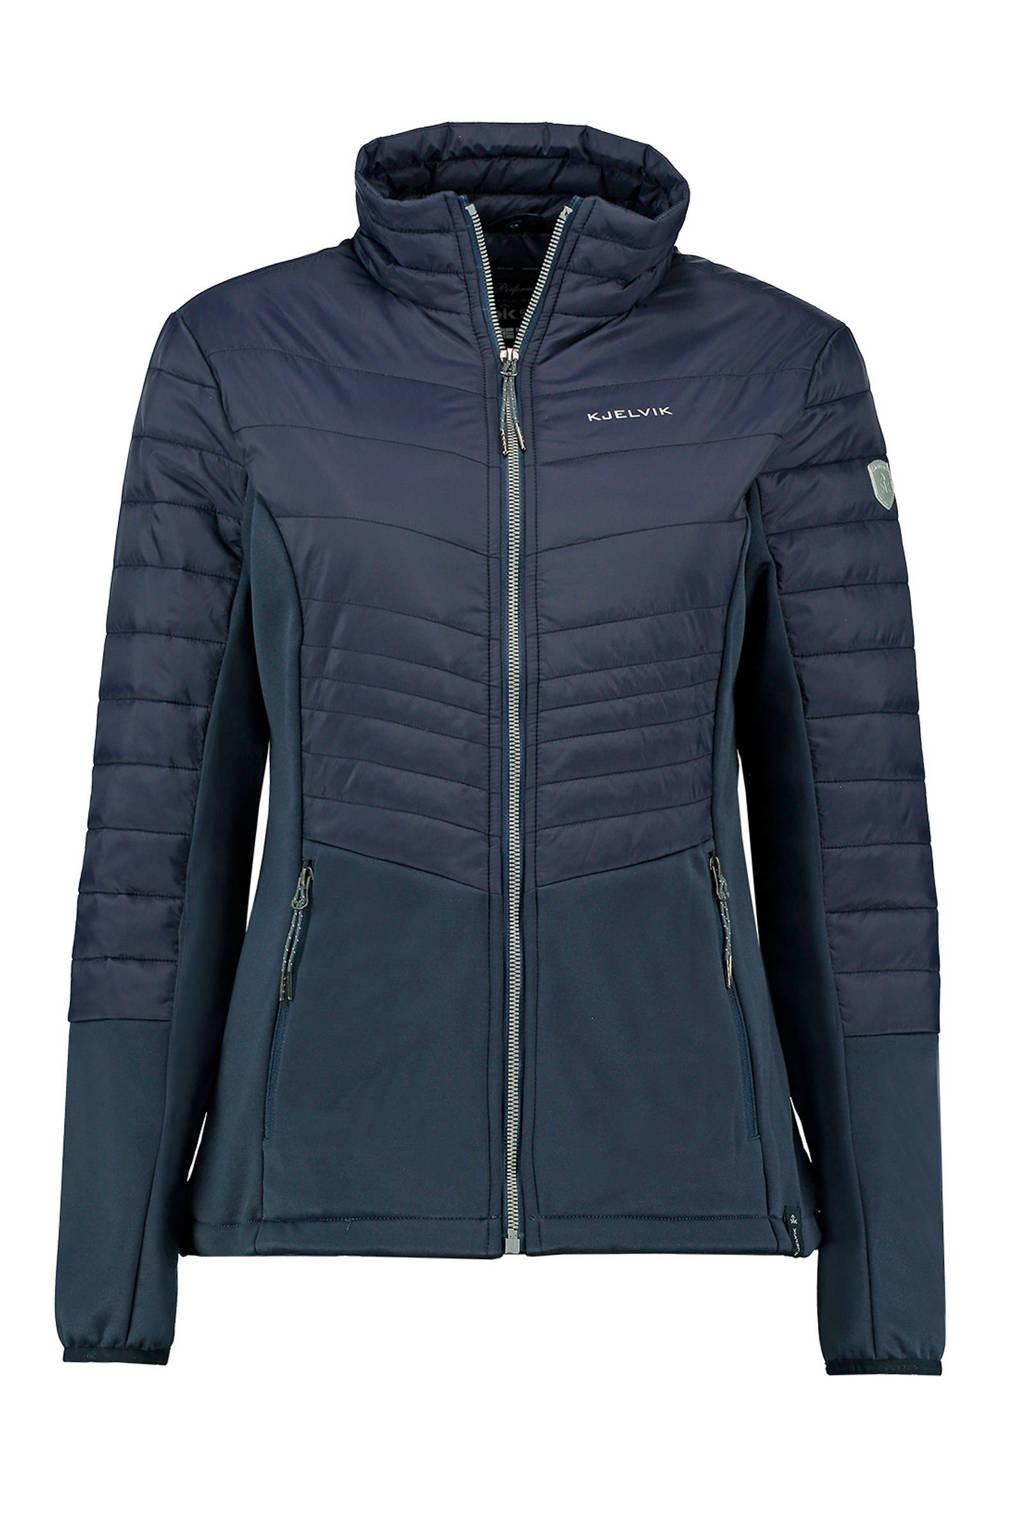 Kjelvik outdoor jas Edyna donkerblauw, Donkerblauw